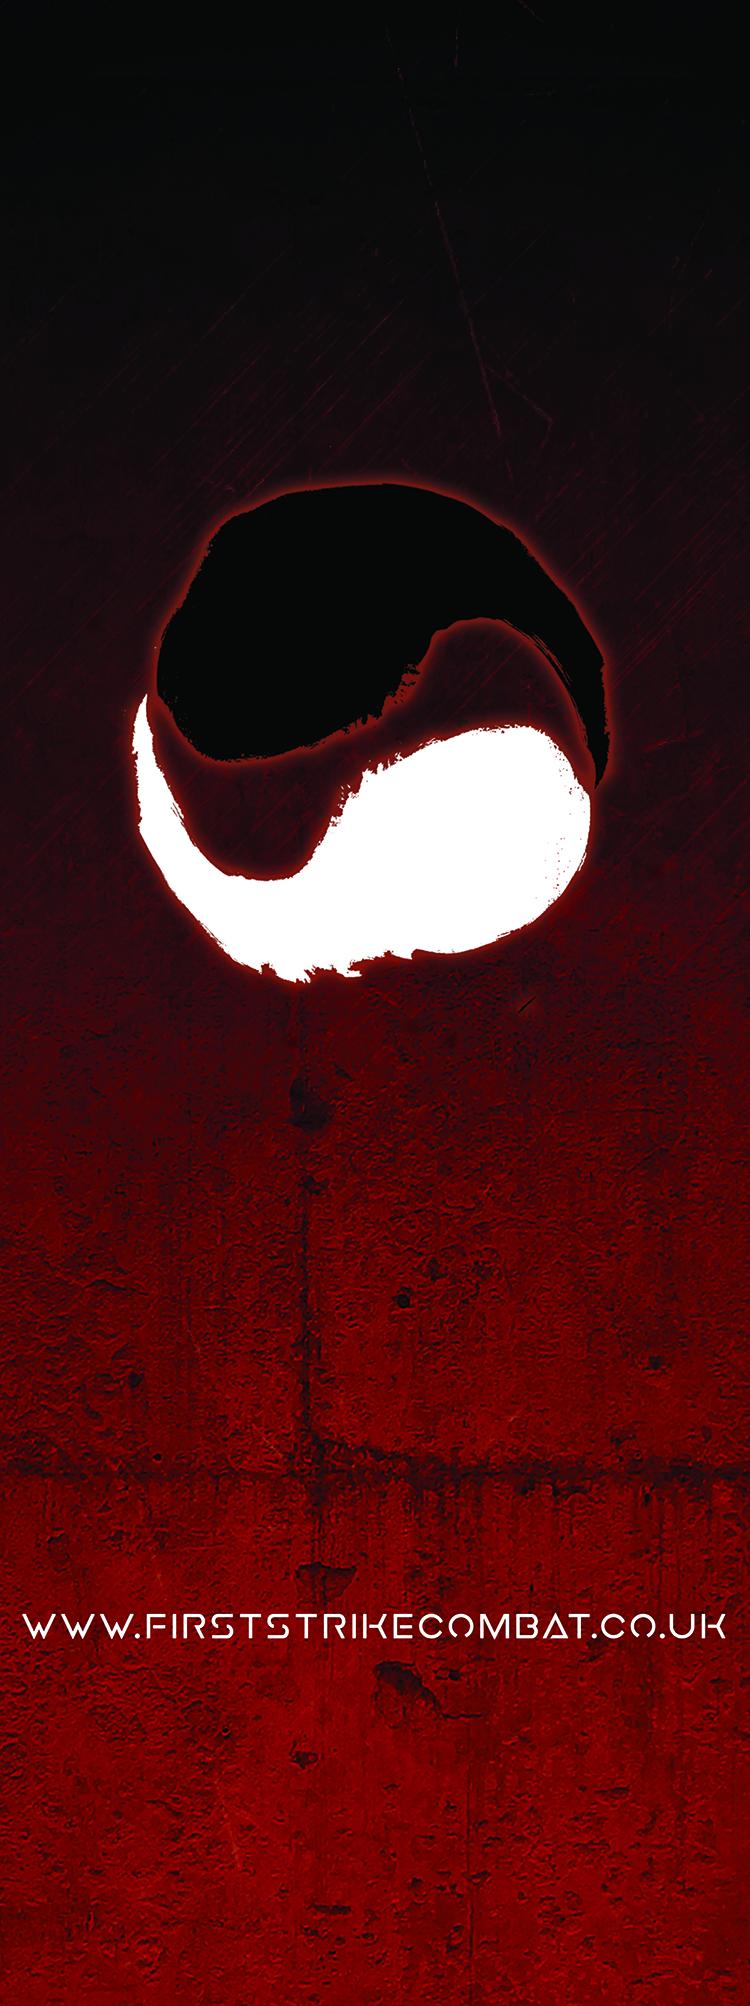 printable-banner-ying-yang-fallen-red-s